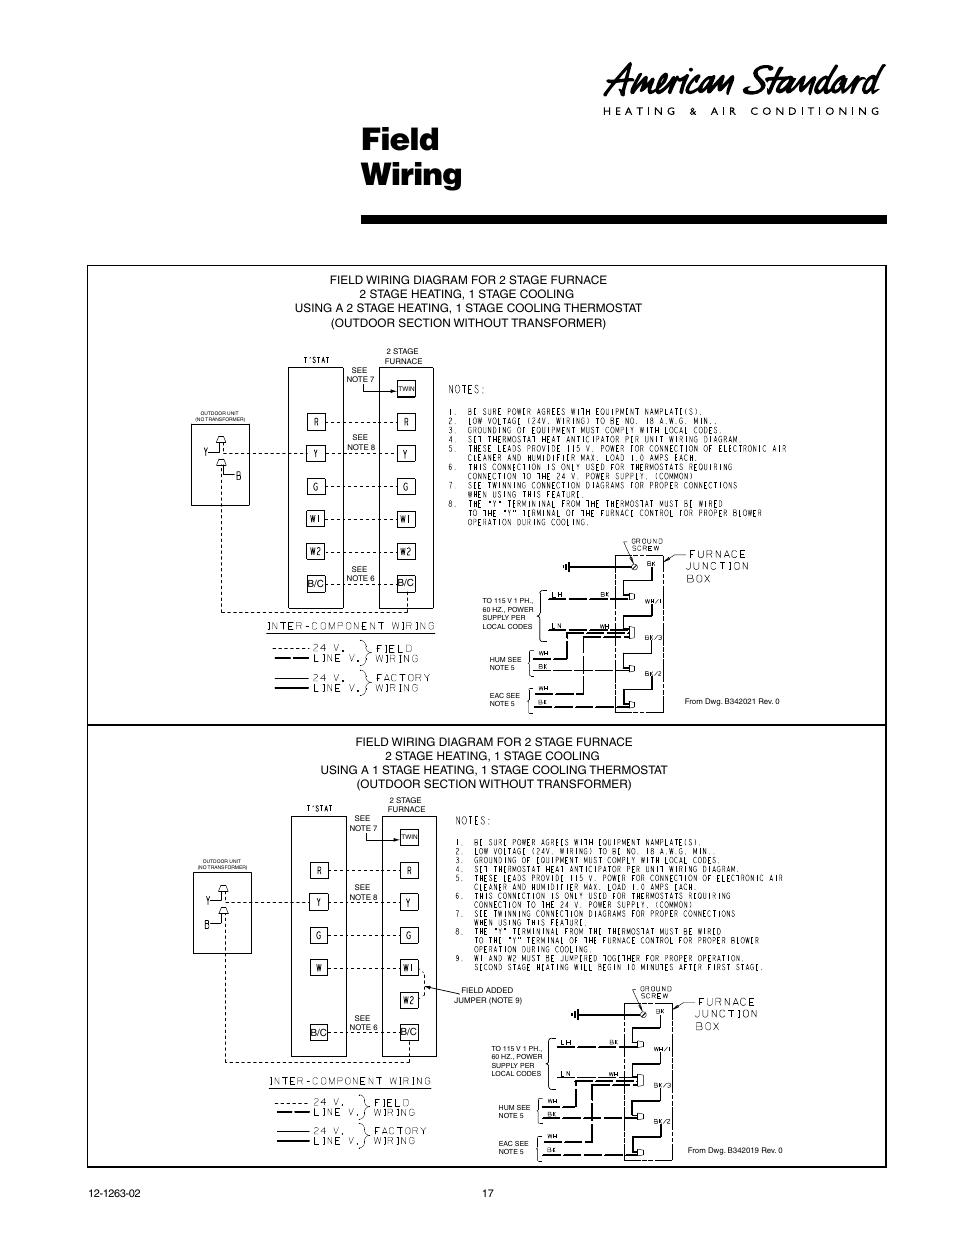 Wiring Diagram  35 American Standard Wiring Diagram